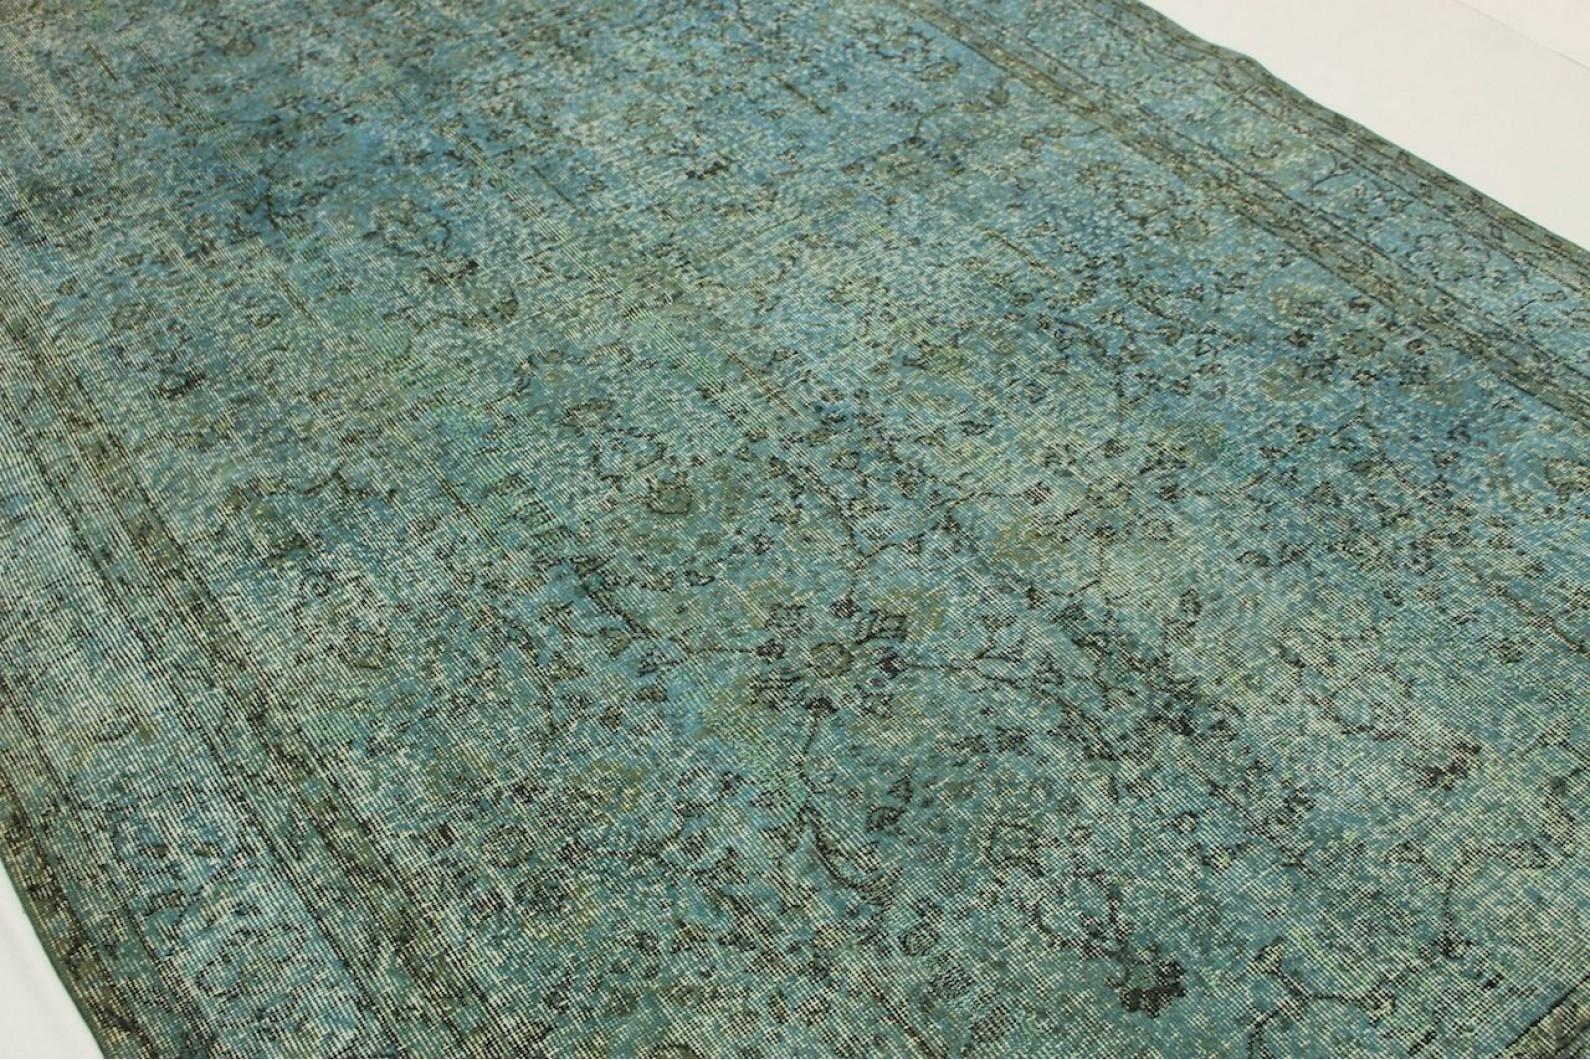 vintage teppich blau grau in 310x200cm 1011 61 bei. Black Bedroom Furniture Sets. Home Design Ideas